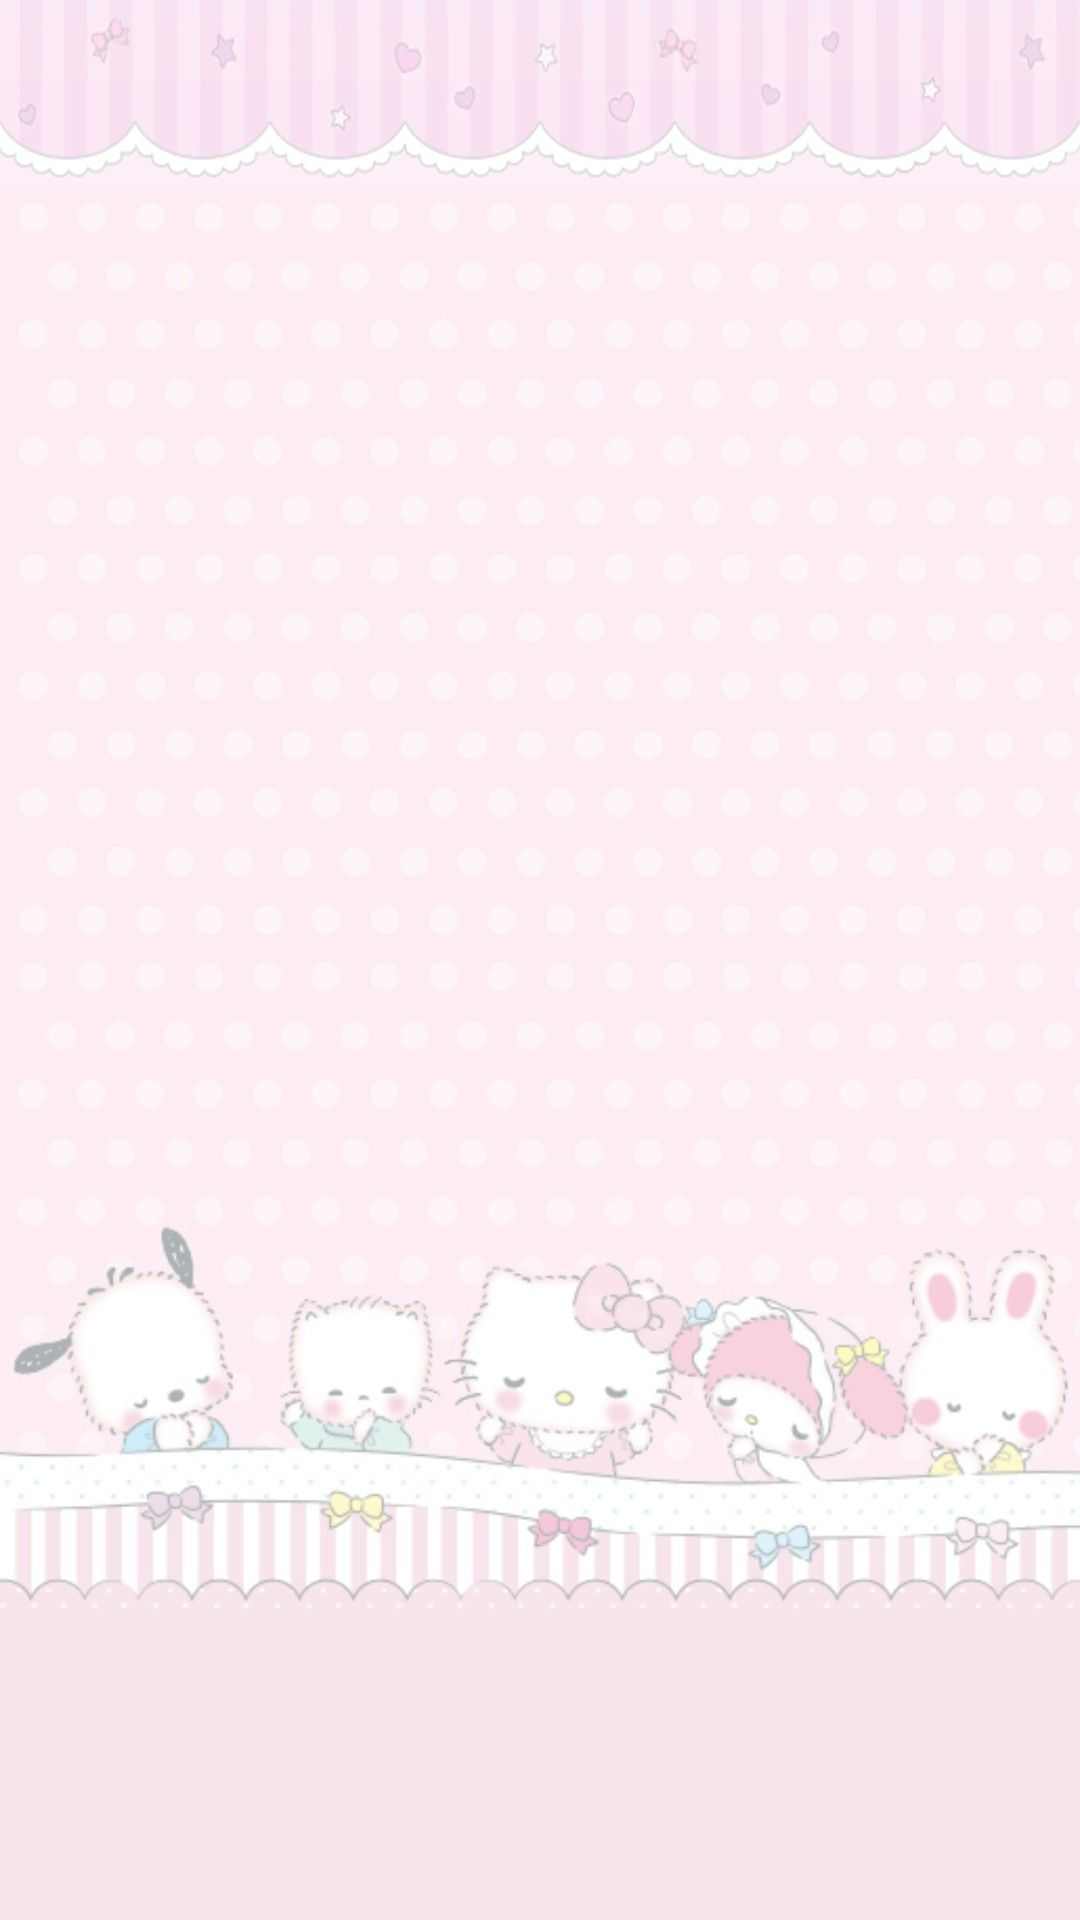 🌸sesshoumaru🌸 — Kawaii baby Sanrio - wallpapers  If use my walls...